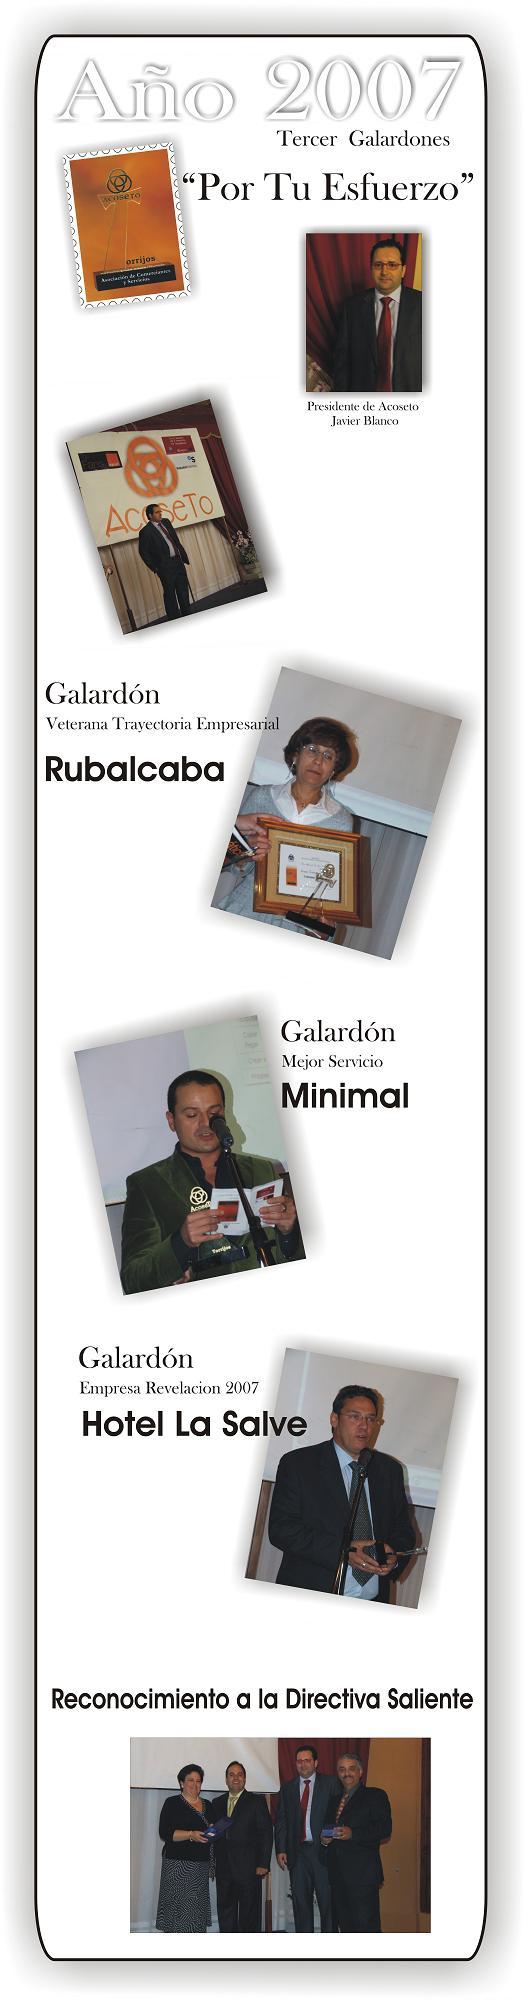 Tercer Galardones 2007